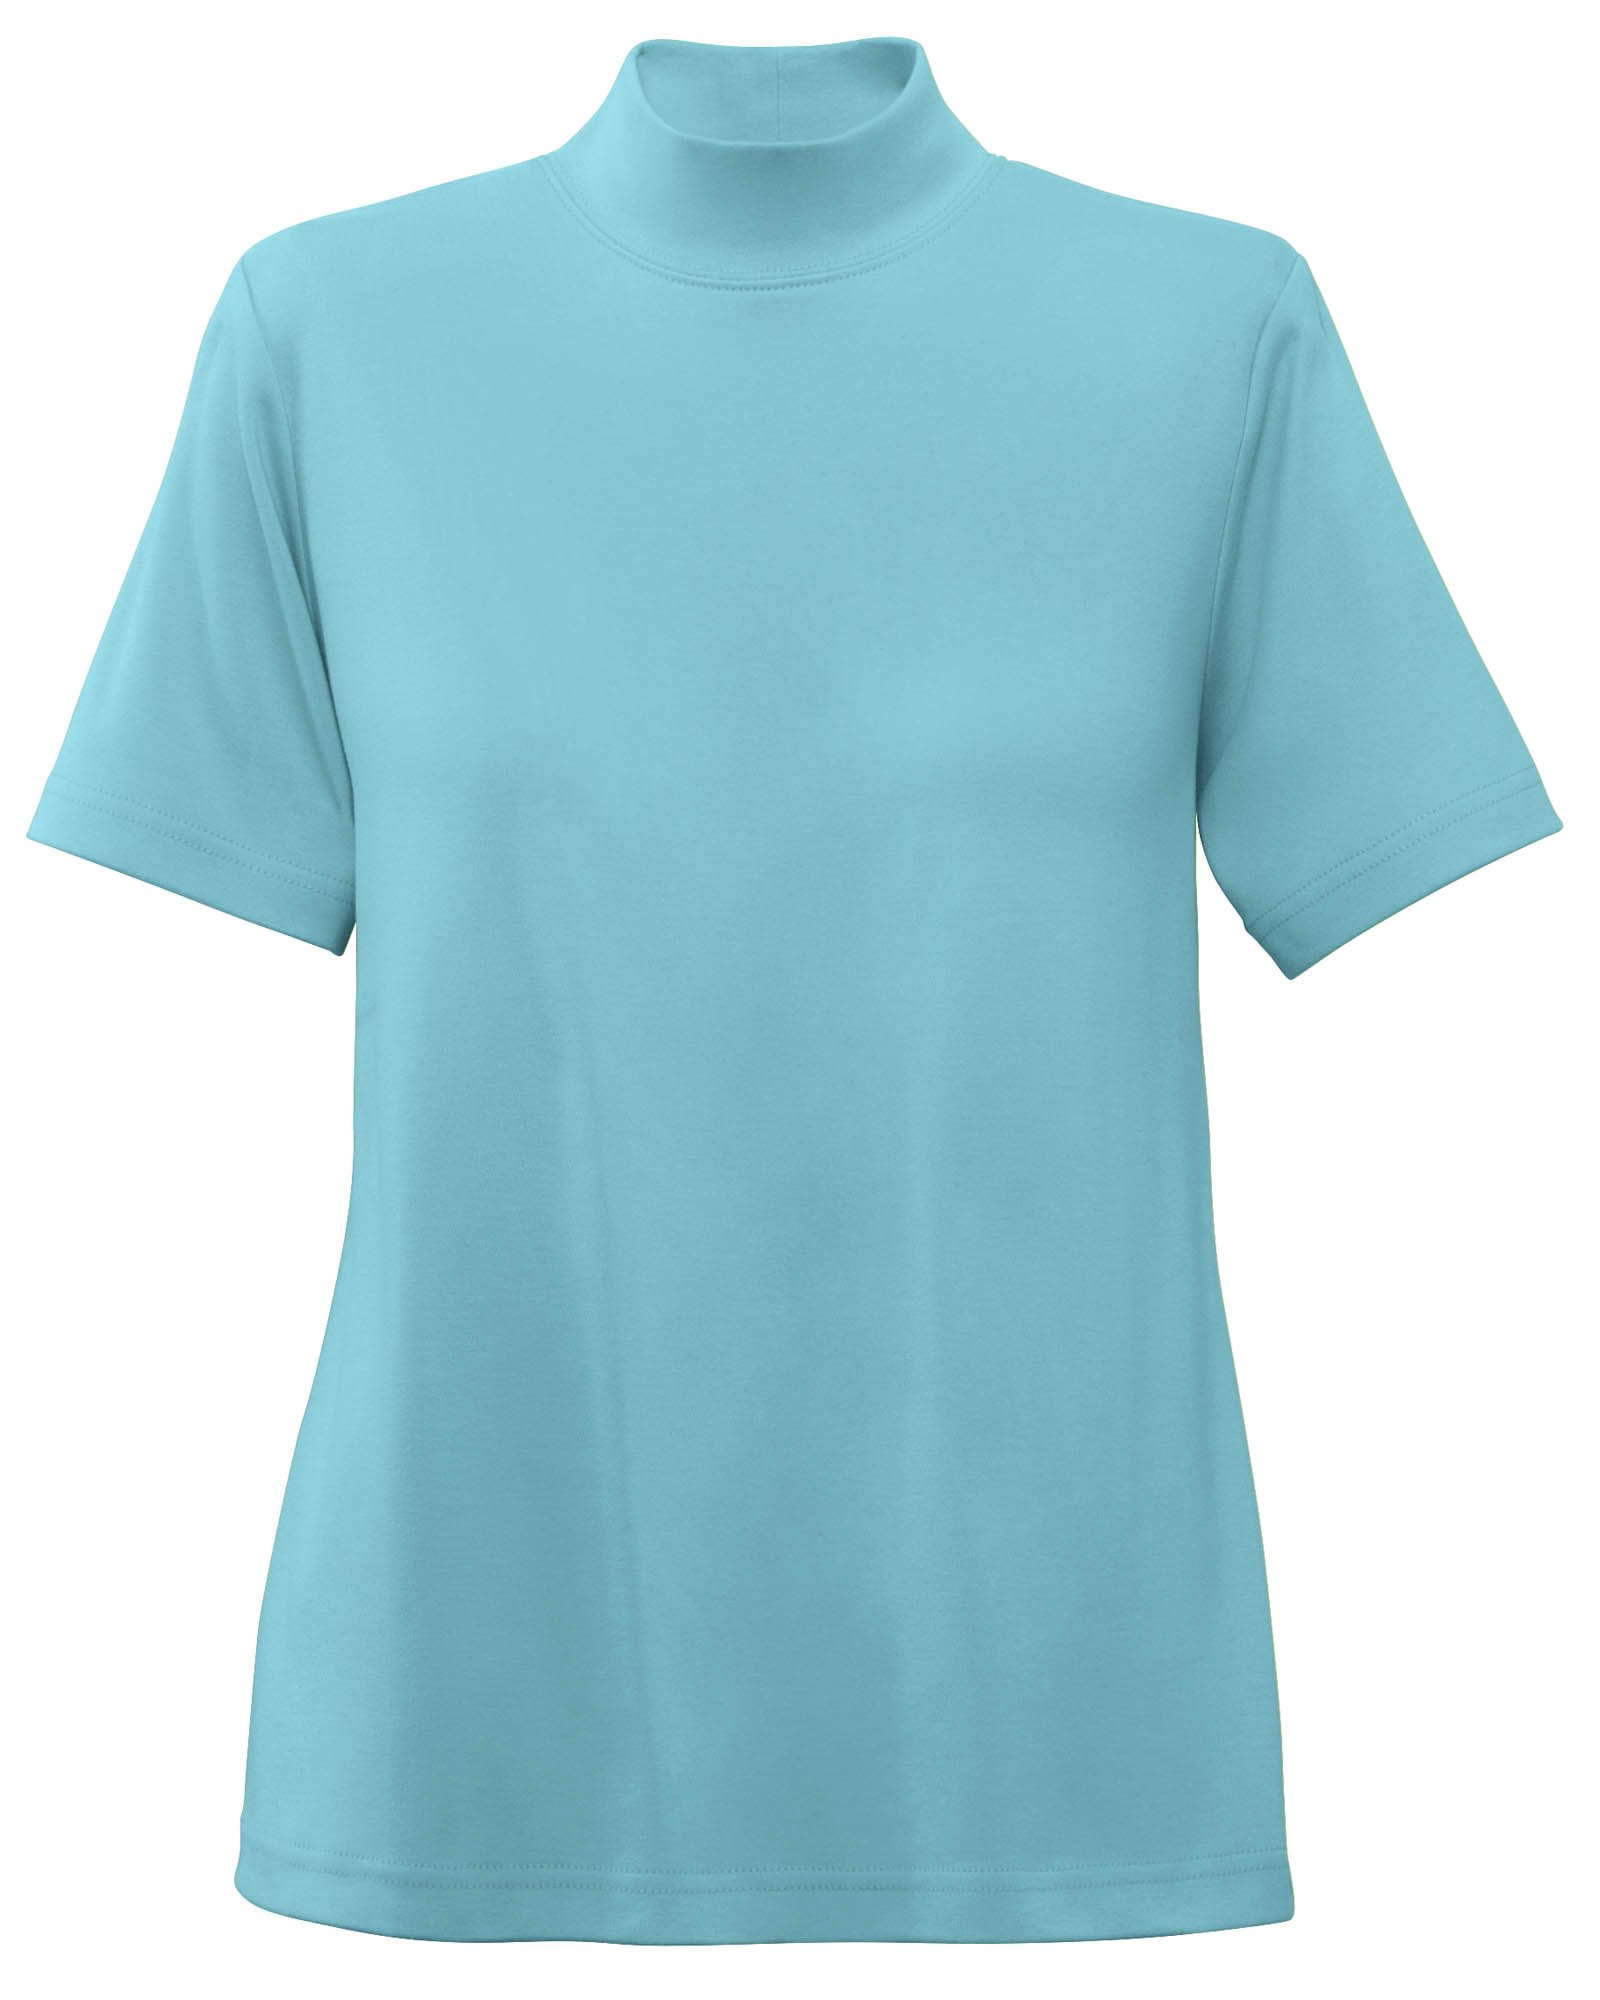 UltraSofts Cotton-Polyester Mock Top, Aqua, X-Large